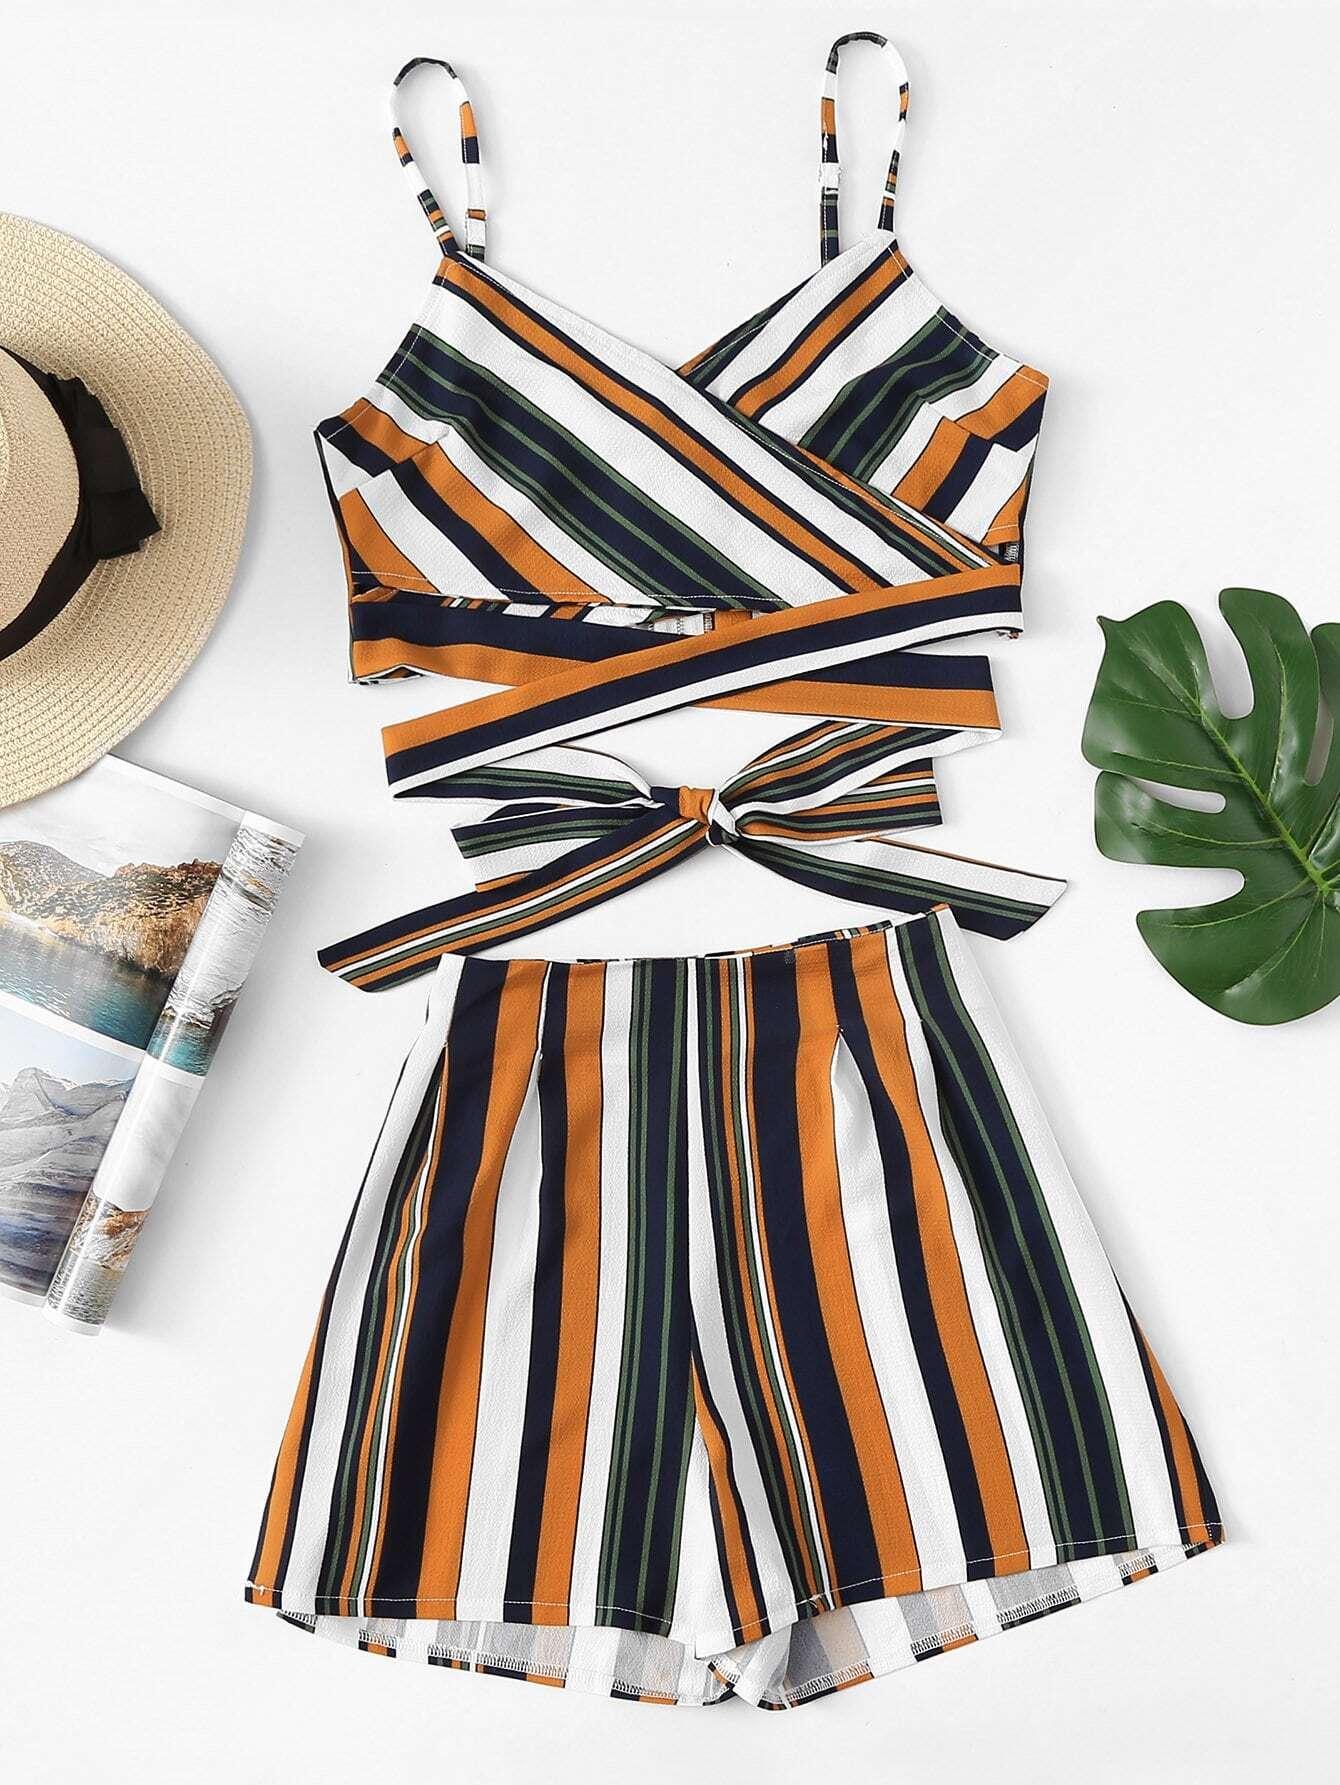 Купить Striped Cross Cami Top с шортами, null, SheIn